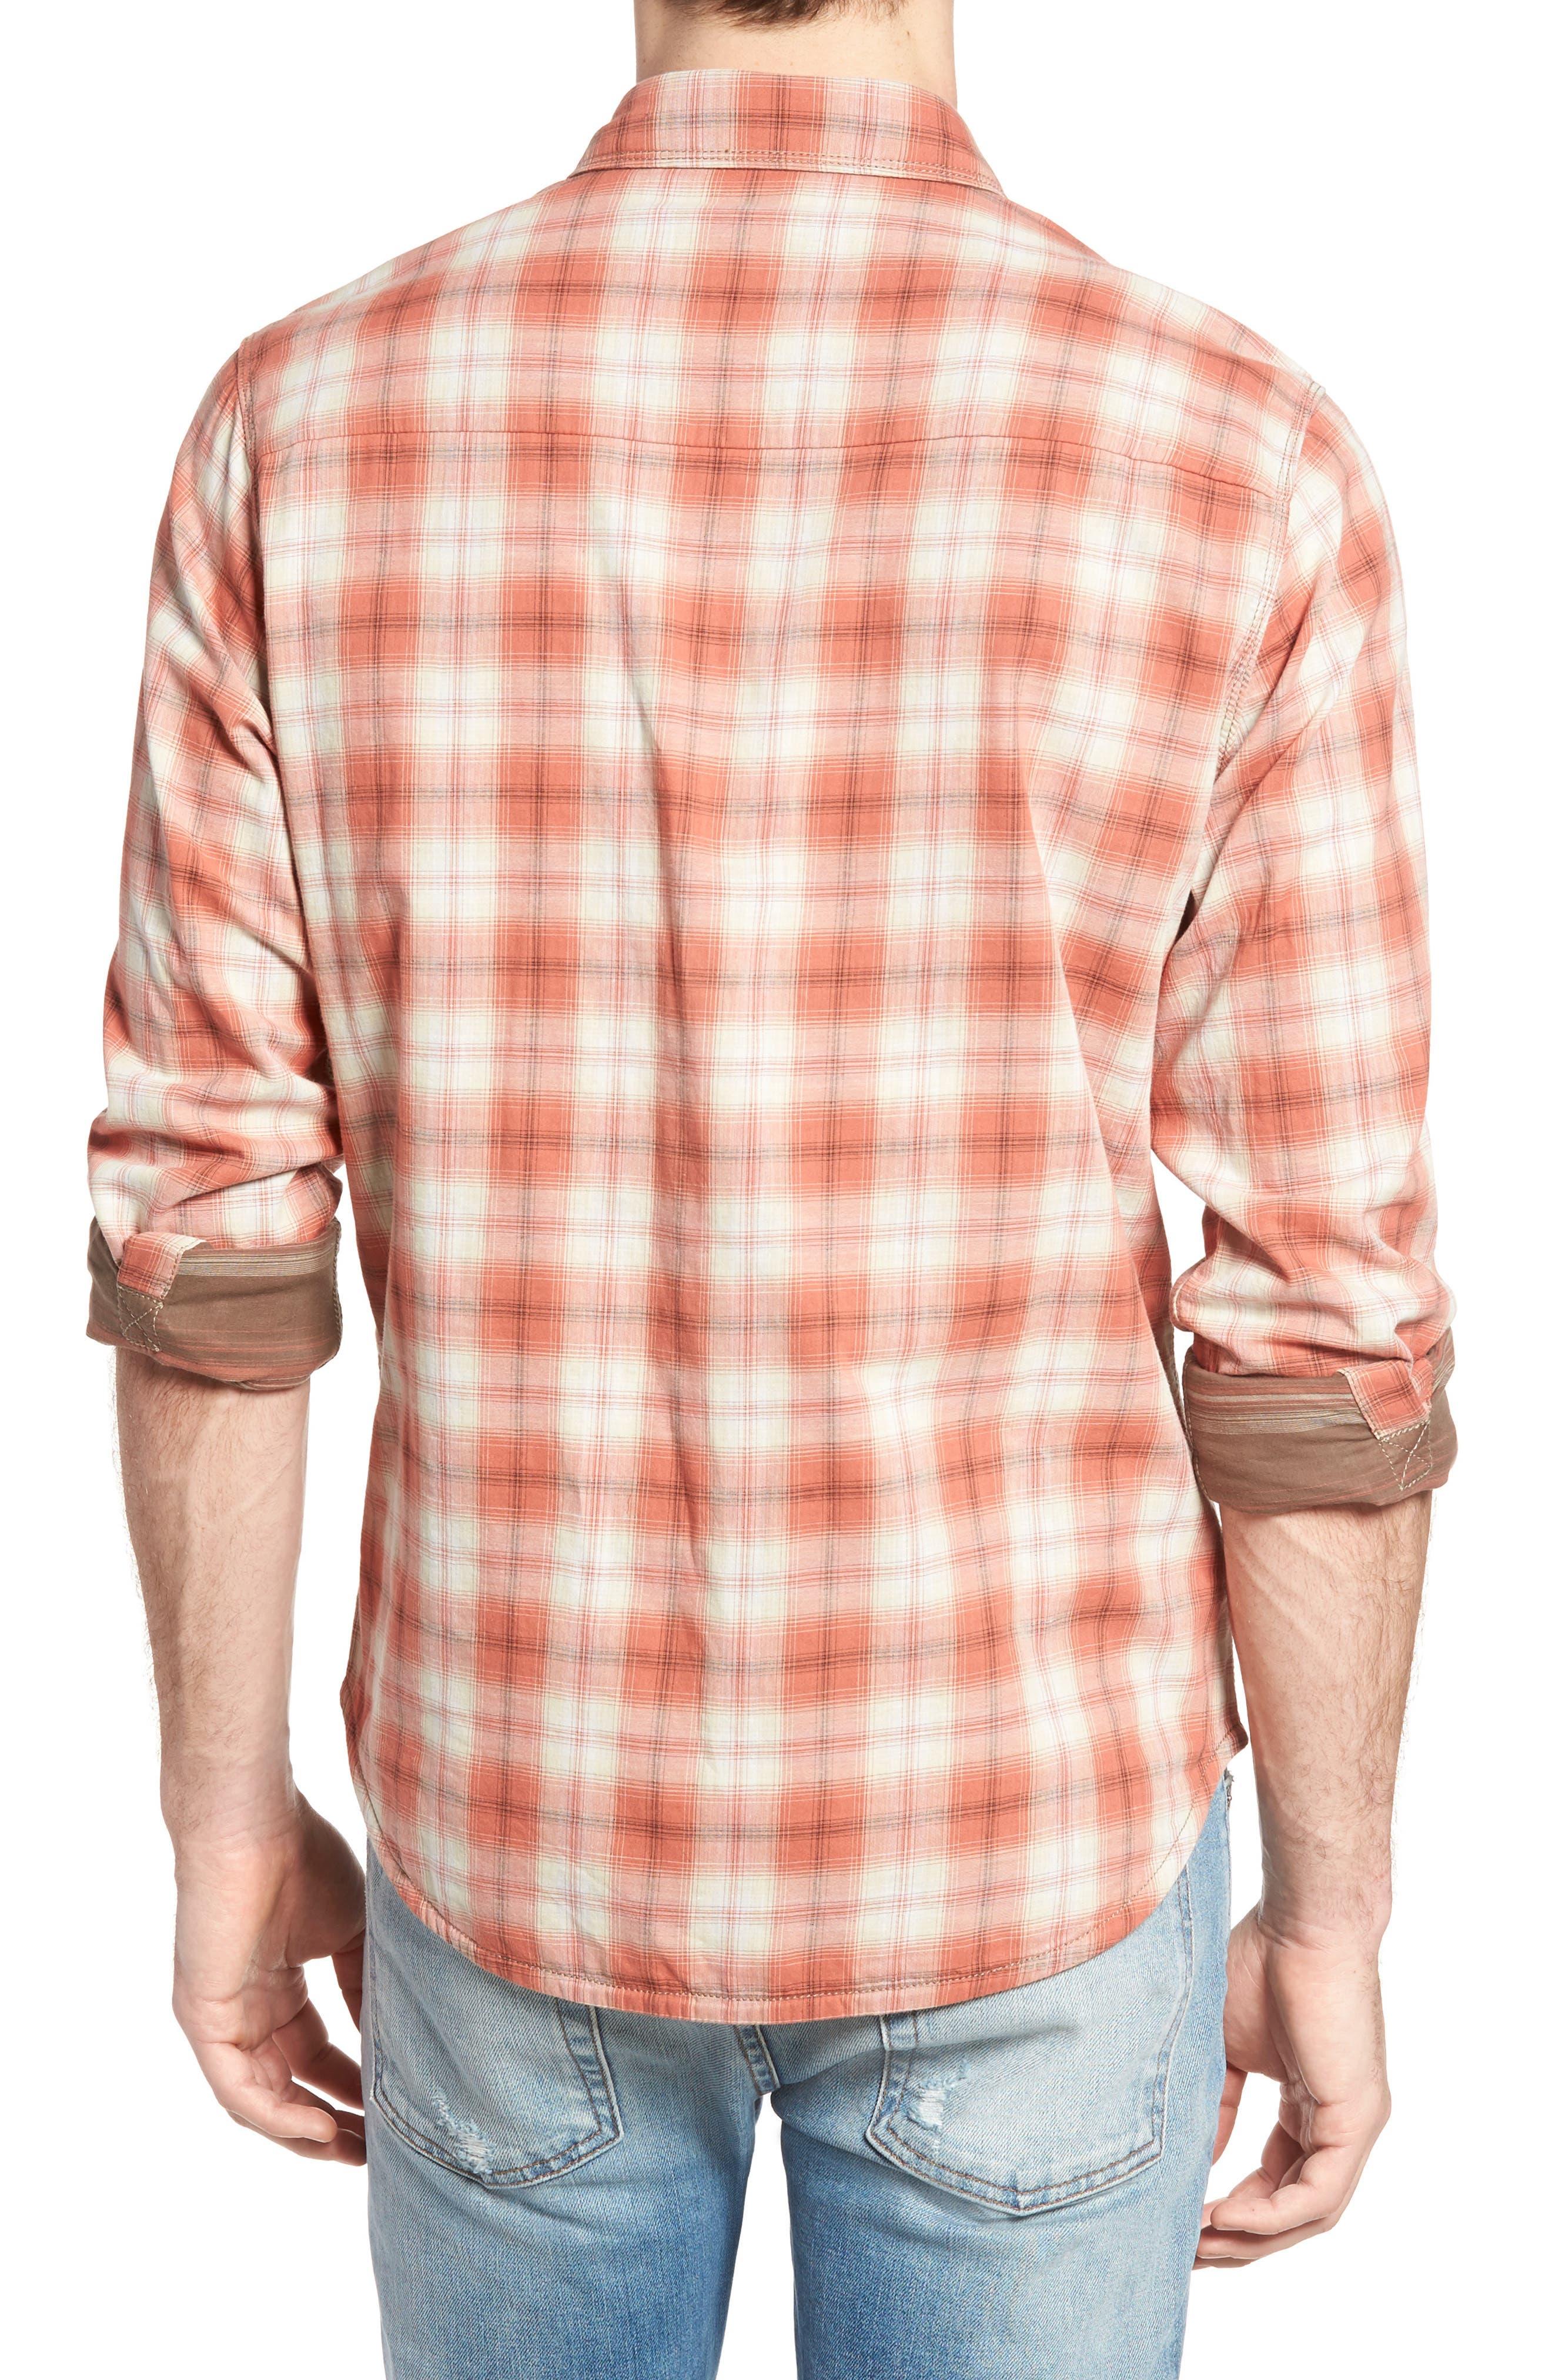 Vogel Regular Fit Reversible Plaid Sport Shirt,                             Alternate thumbnail 2, color,                             201